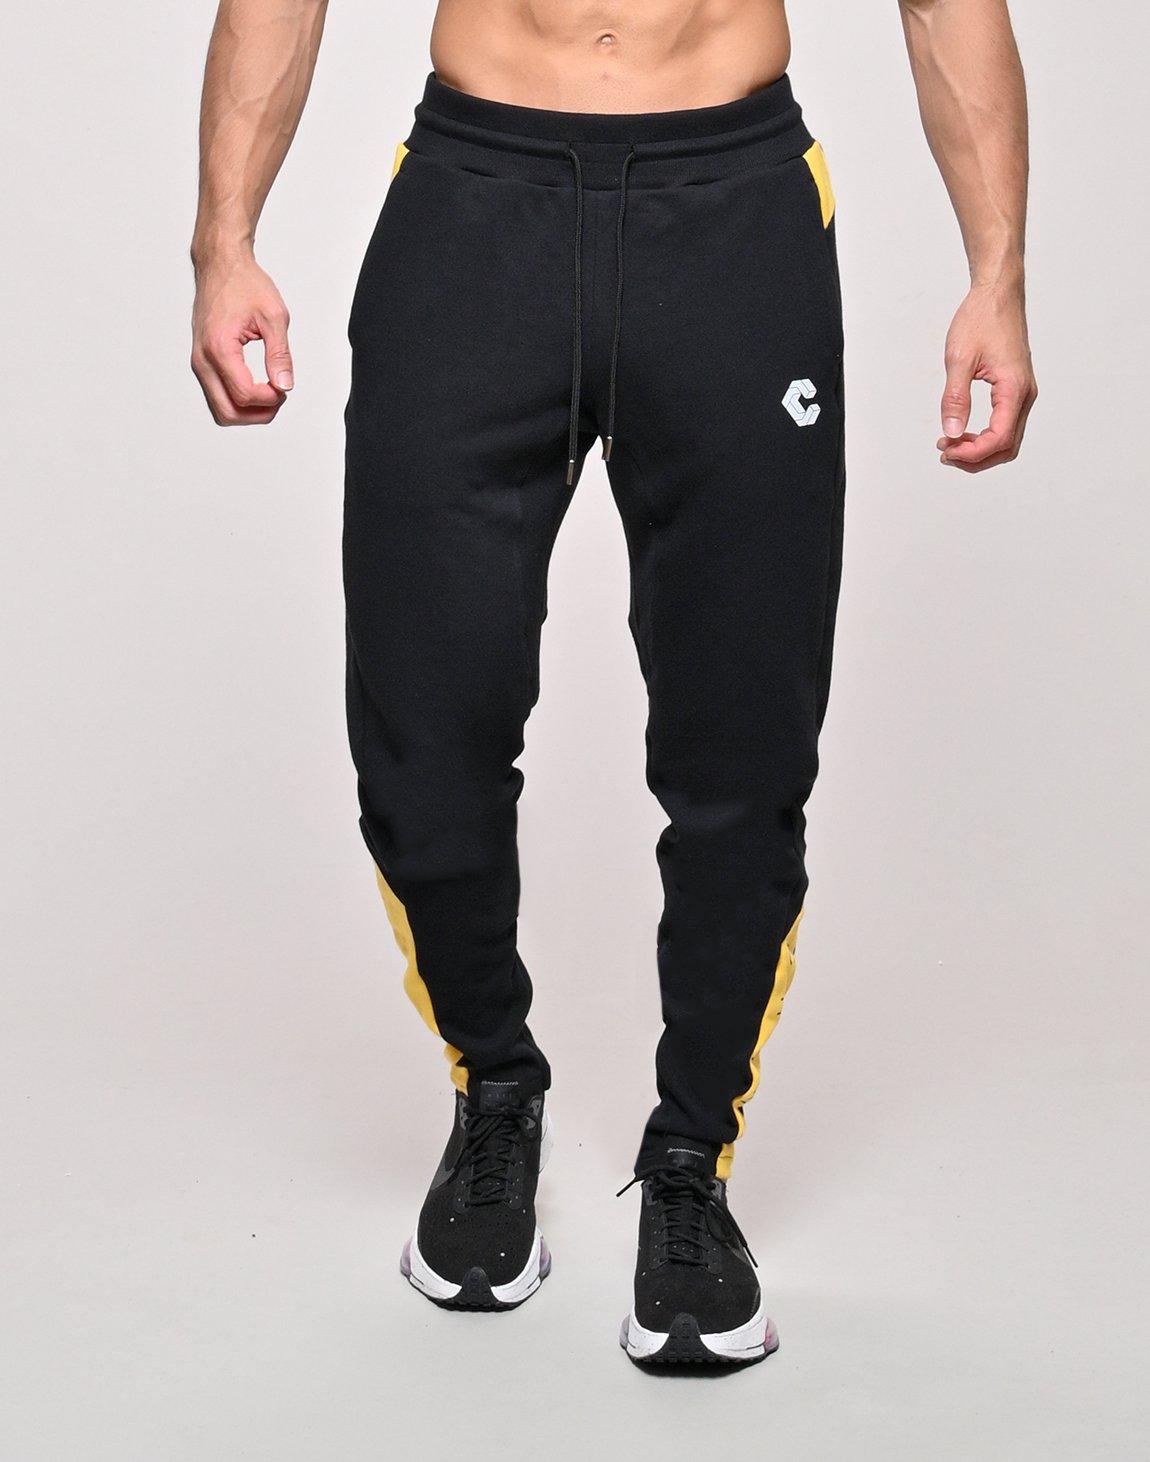 CRONOS SIDE CALF LOGO SWEAT PANTS【BLACK×YELLOW】